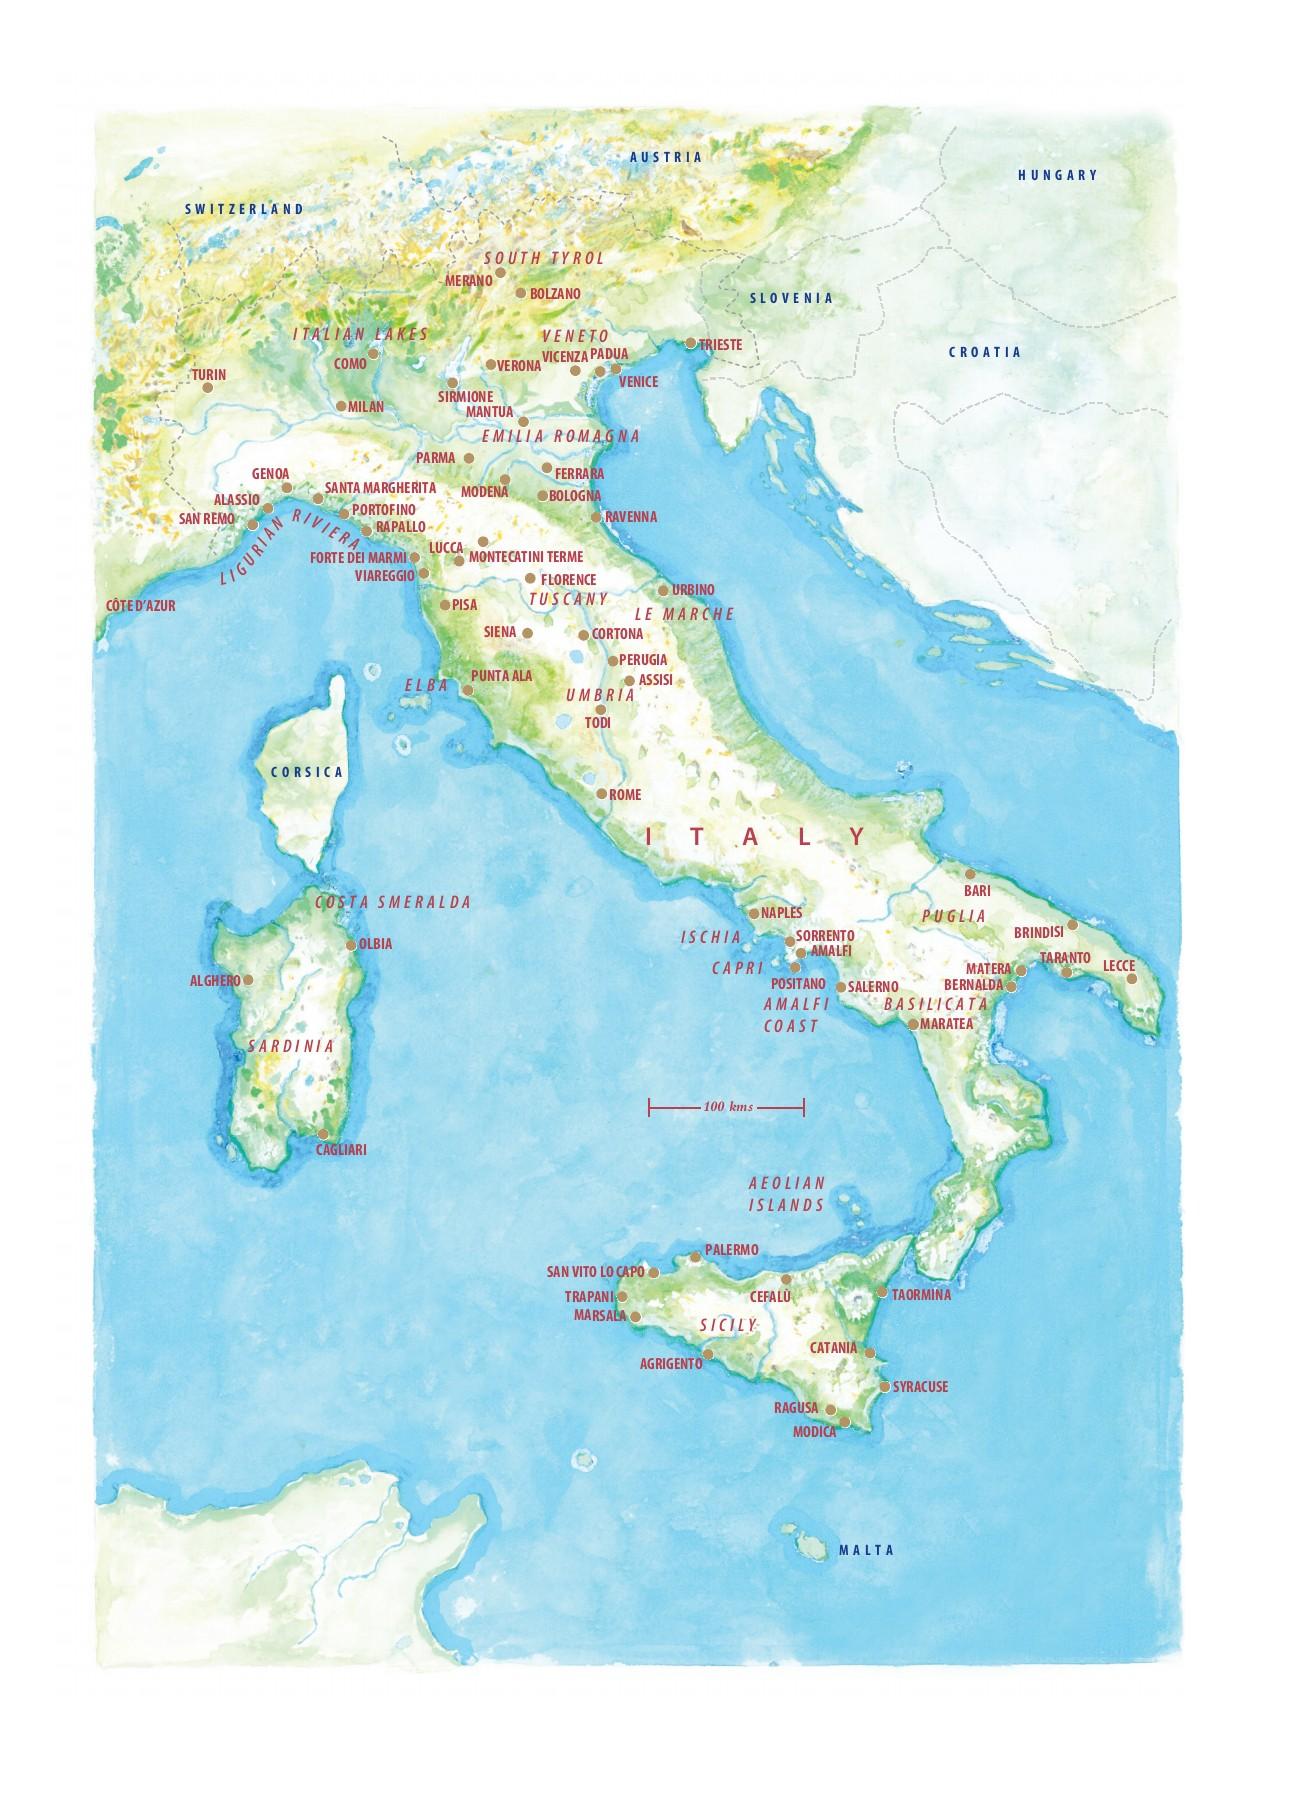 Ristorante Martina Rosa Ischia 2163_italy 2019-20_web-flip book pages 1-50 | pubhtml5